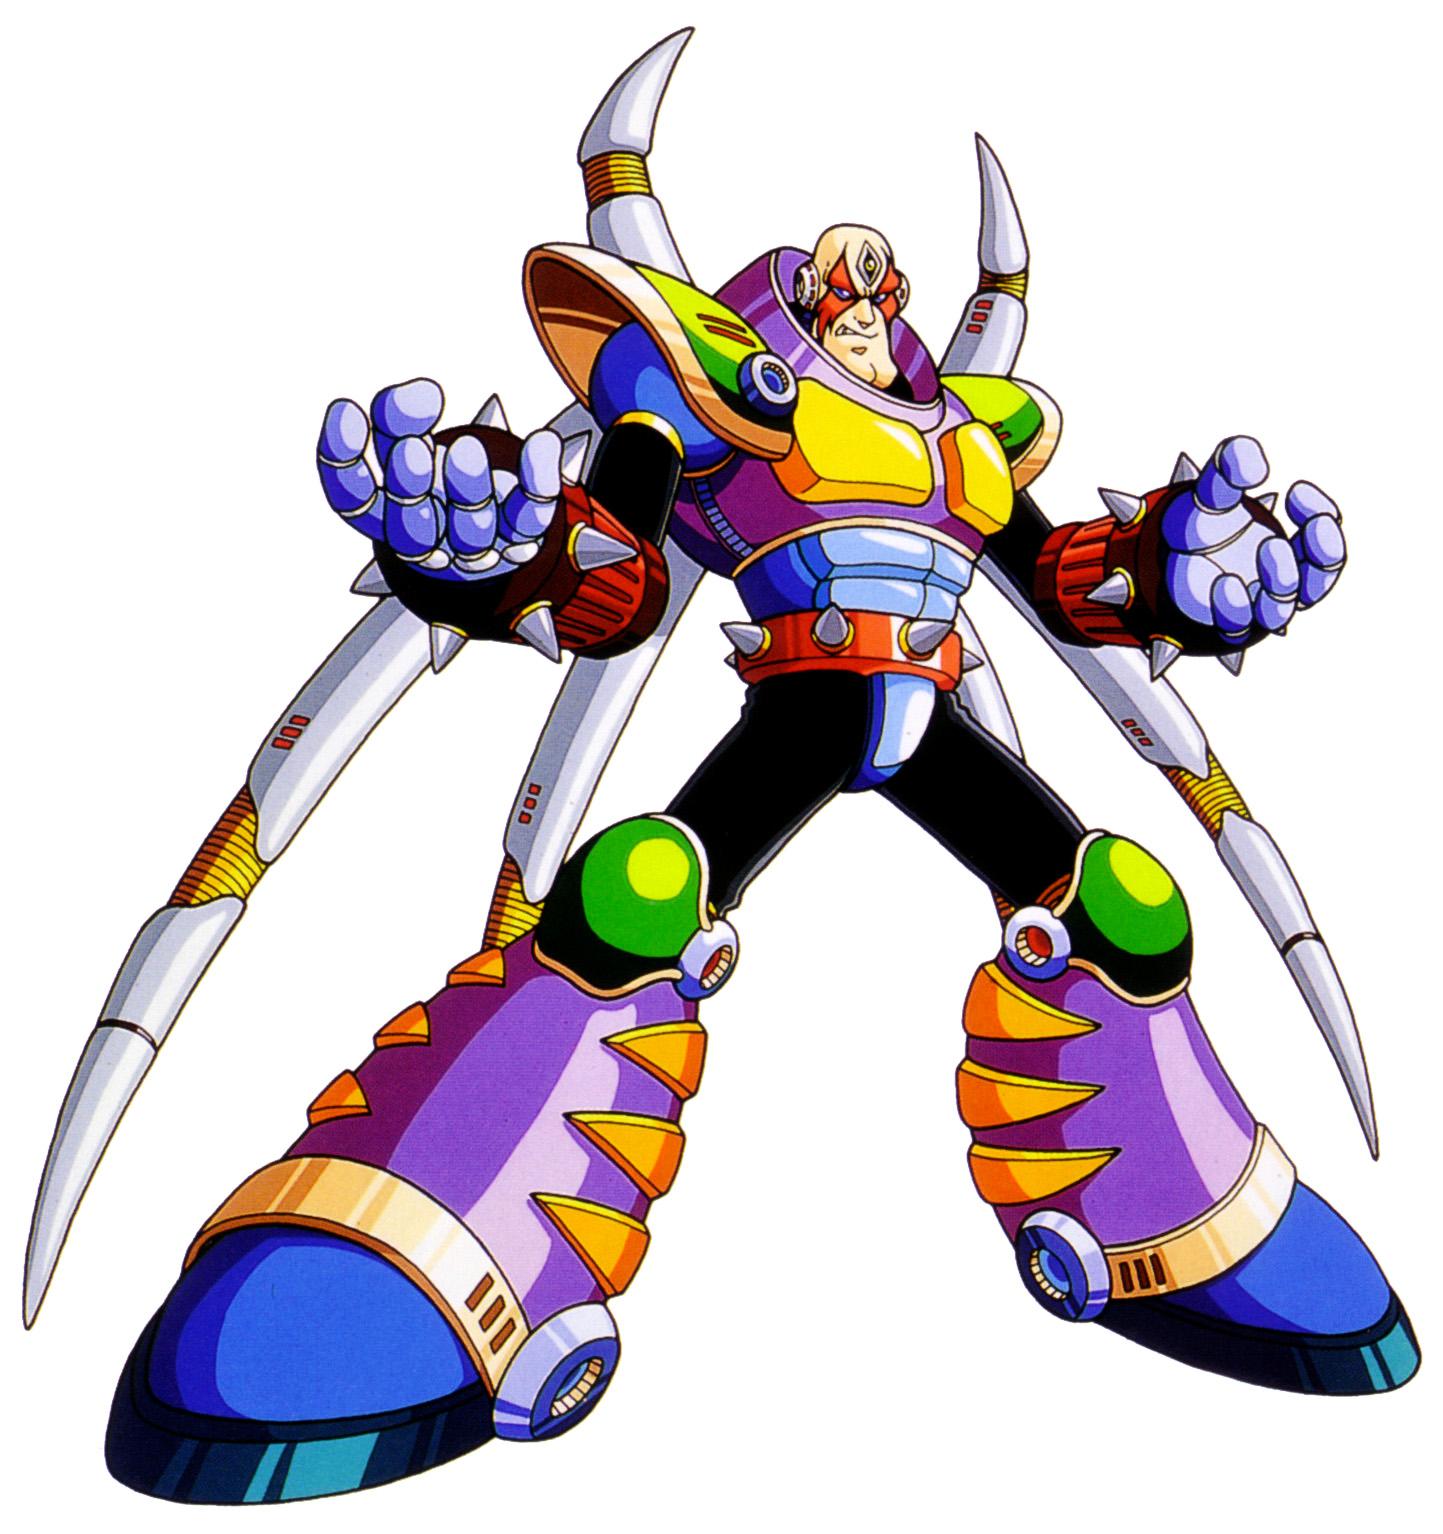 Mmkb The Mega Man Knowledge Base: Neo 2SigmaX3